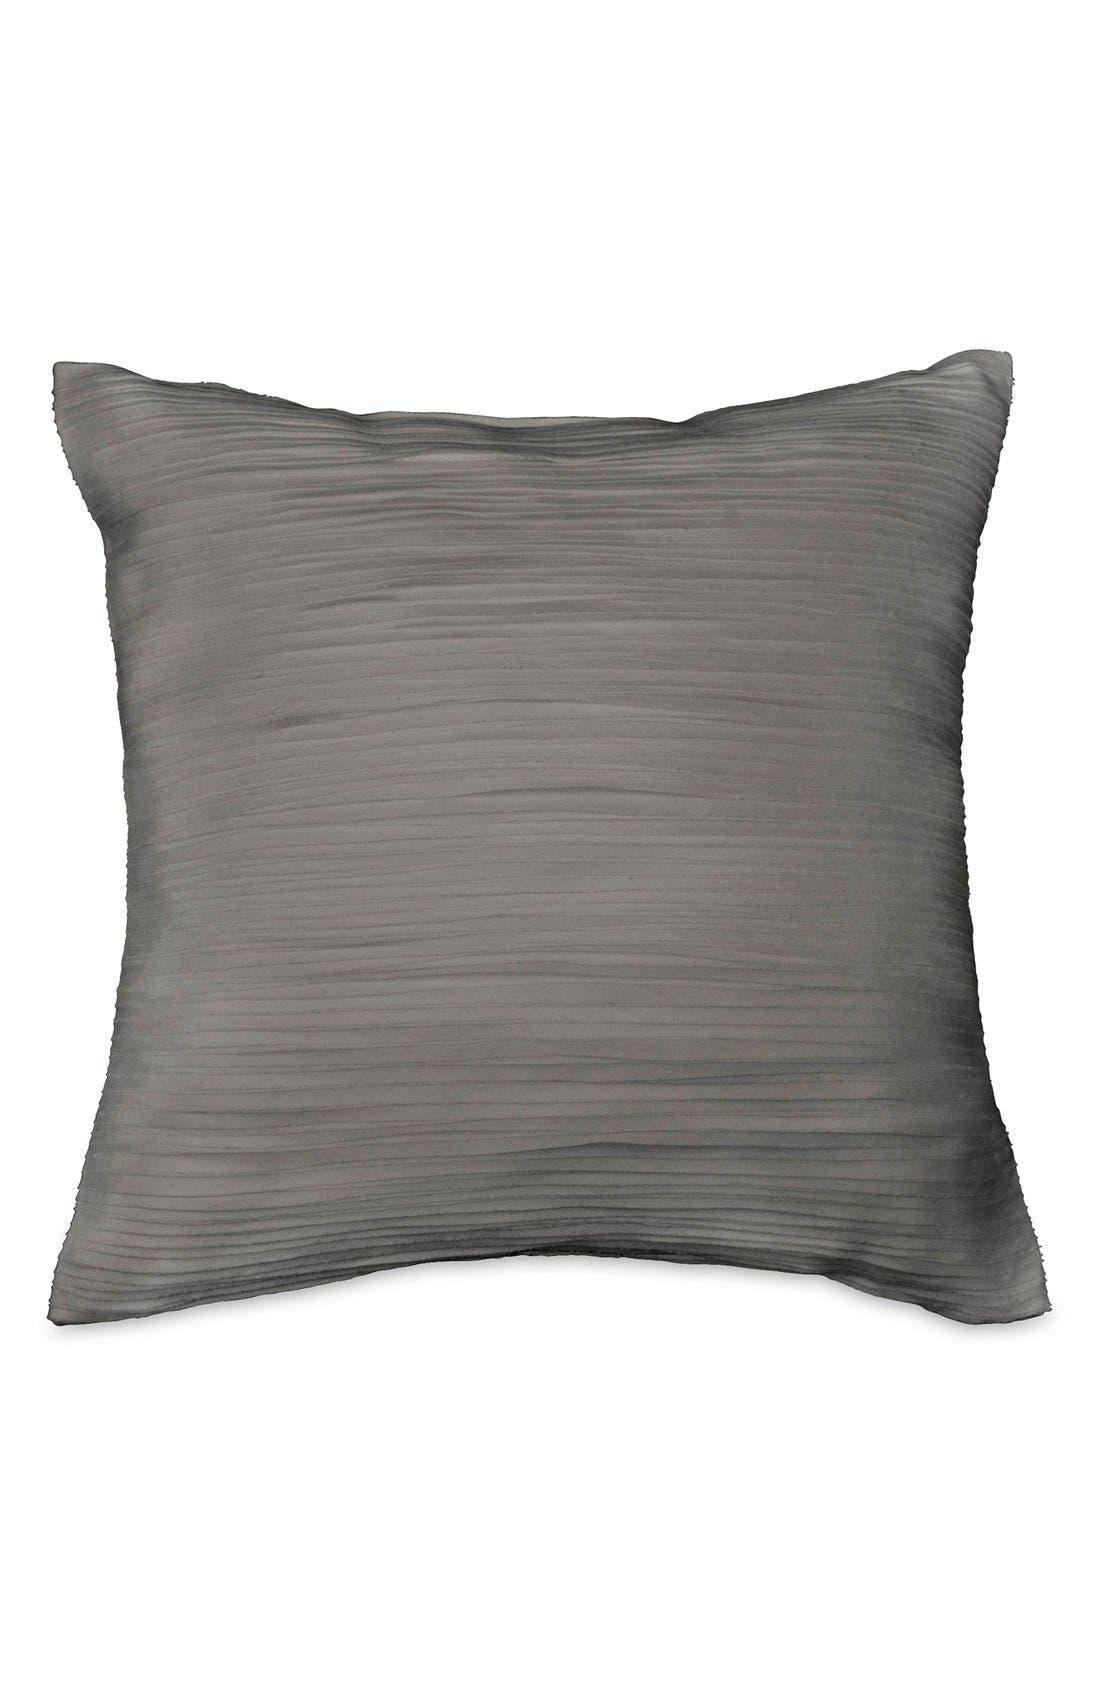 Main Image - Donna Karan Collection 'Silk Essentials' Pillow